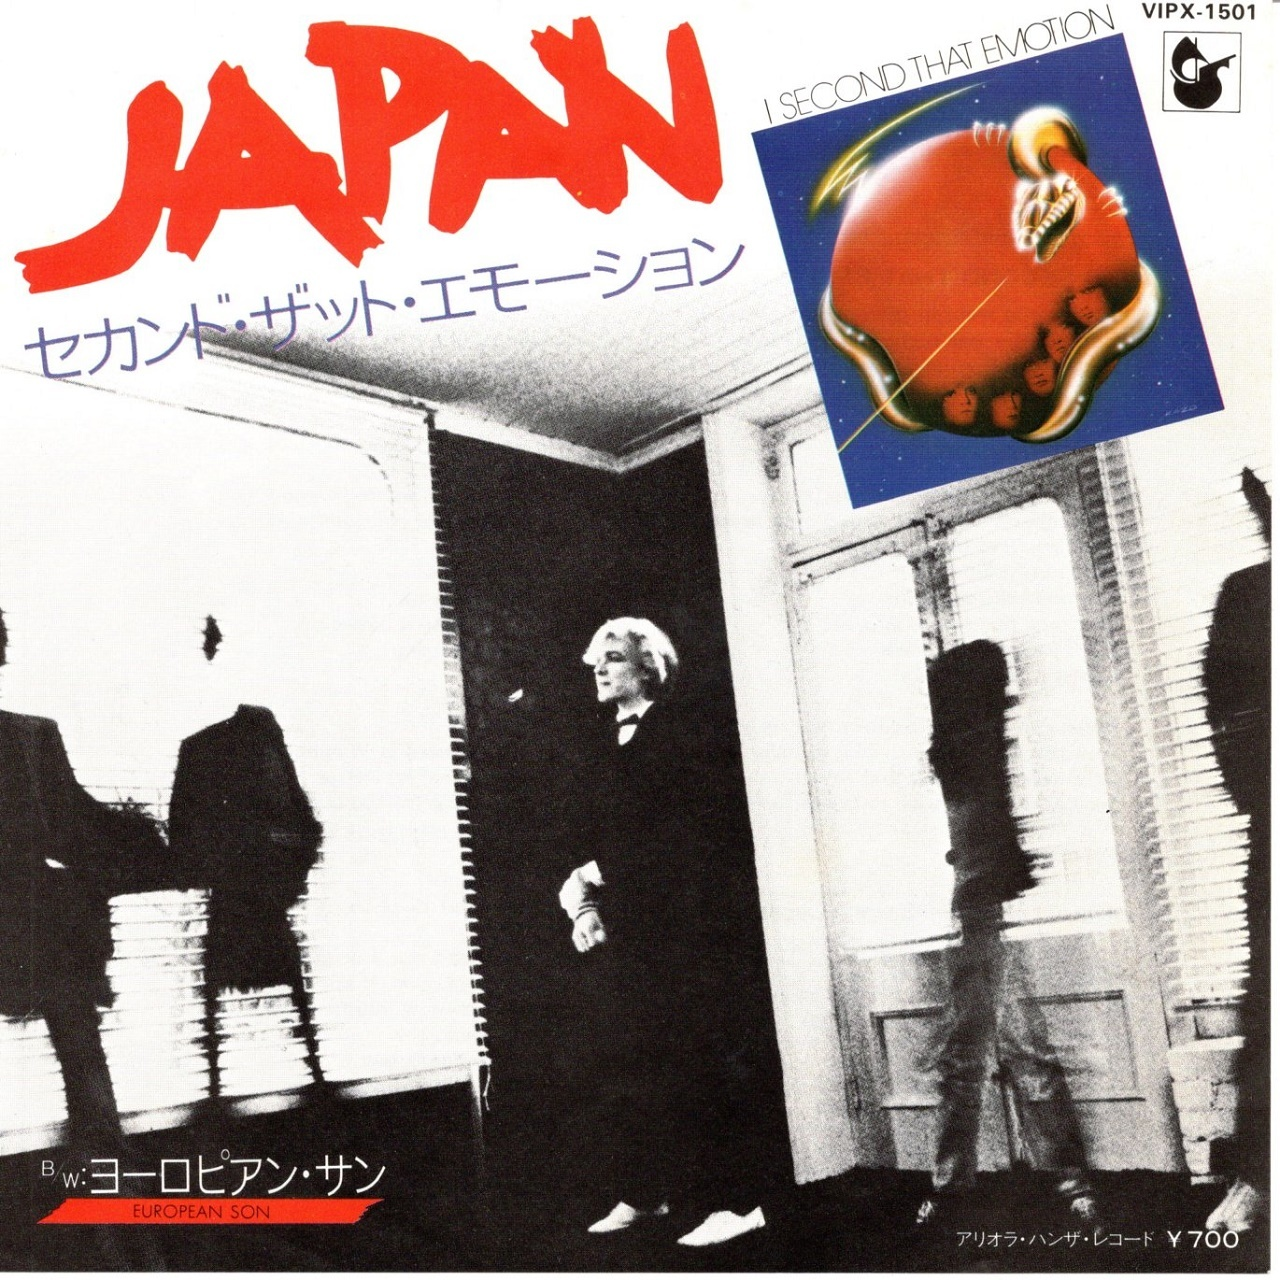 【7inch・国内盤】ジャパン  /  セカンド・ザット・エモーション